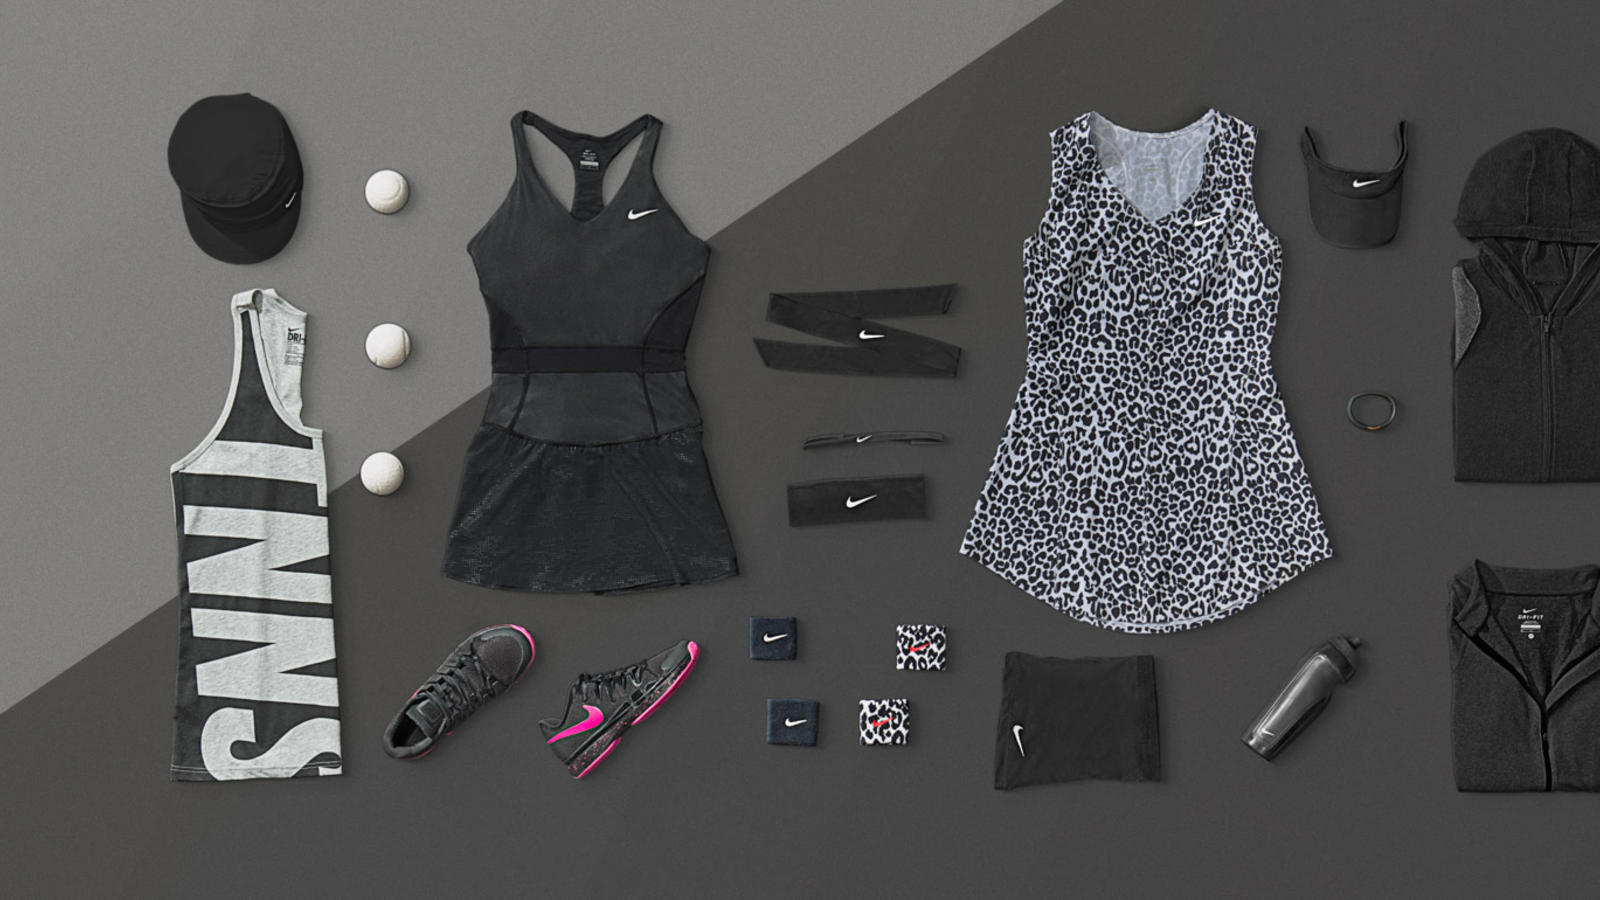 Nike Tennis NYC Night Look - Maria & Serena